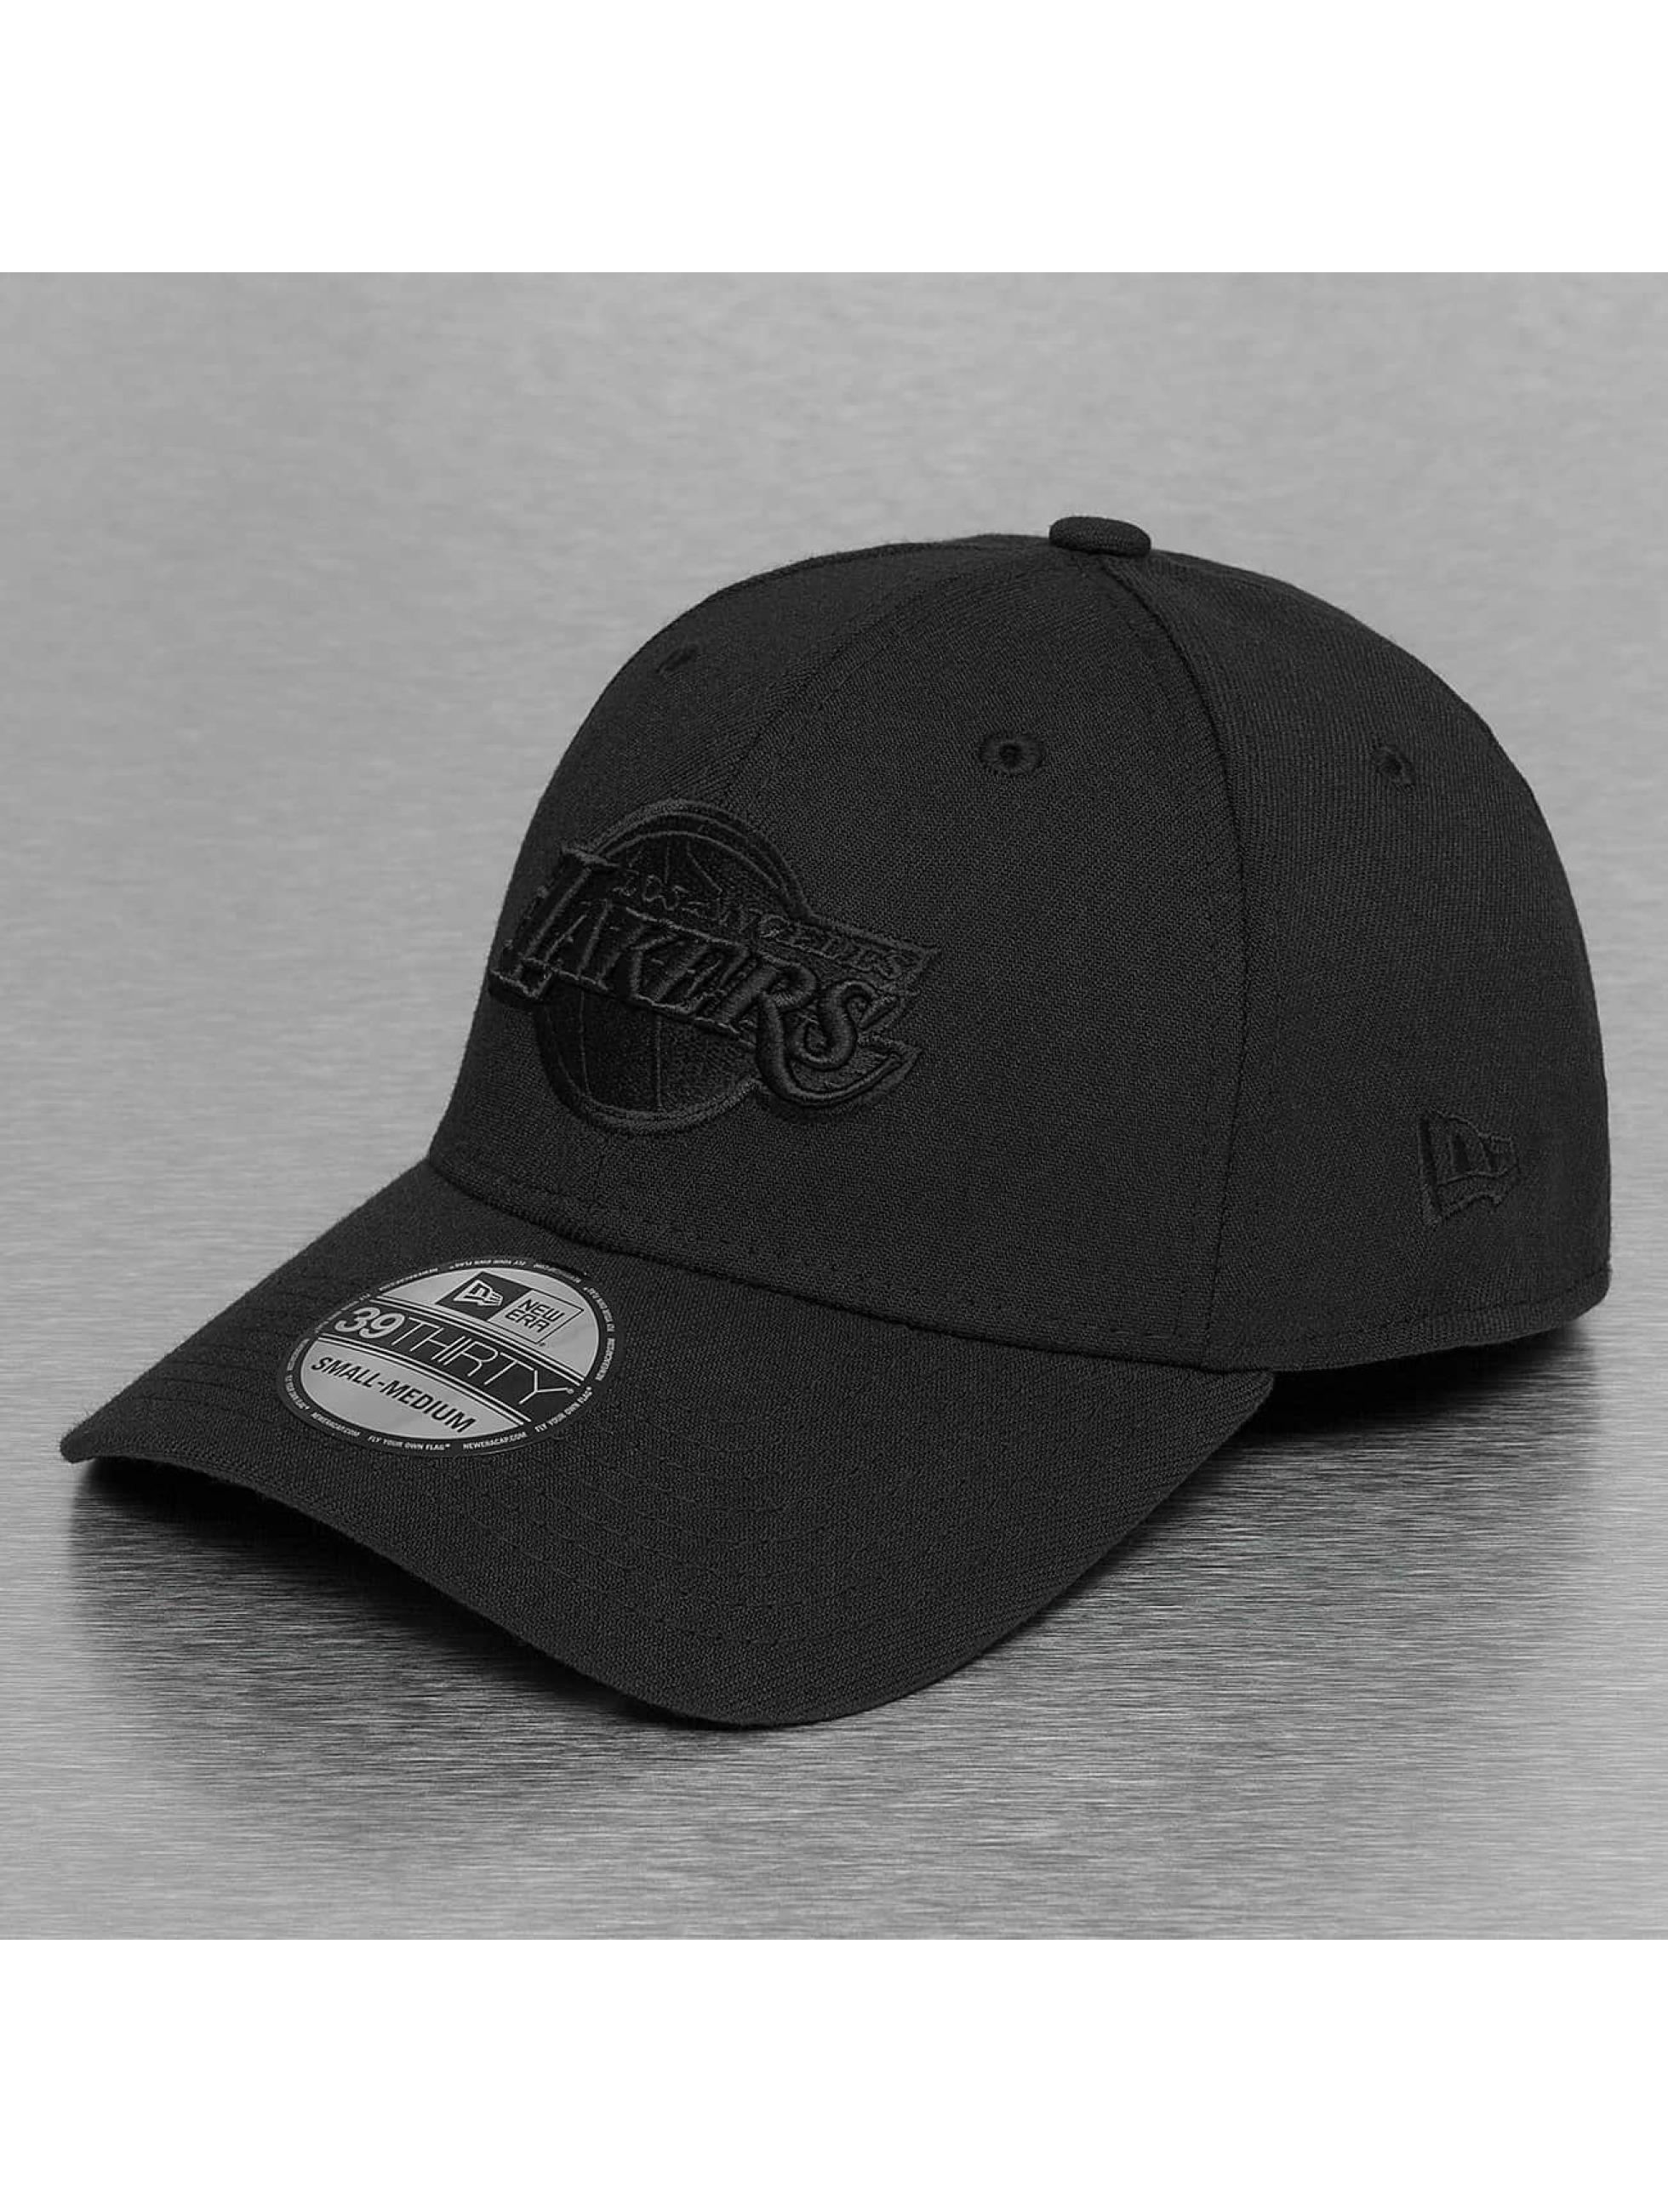 New Era NBA Black On LA Lakers 39Thirty Flexfitted Cap Black/Black Sale Angebote Reuthen